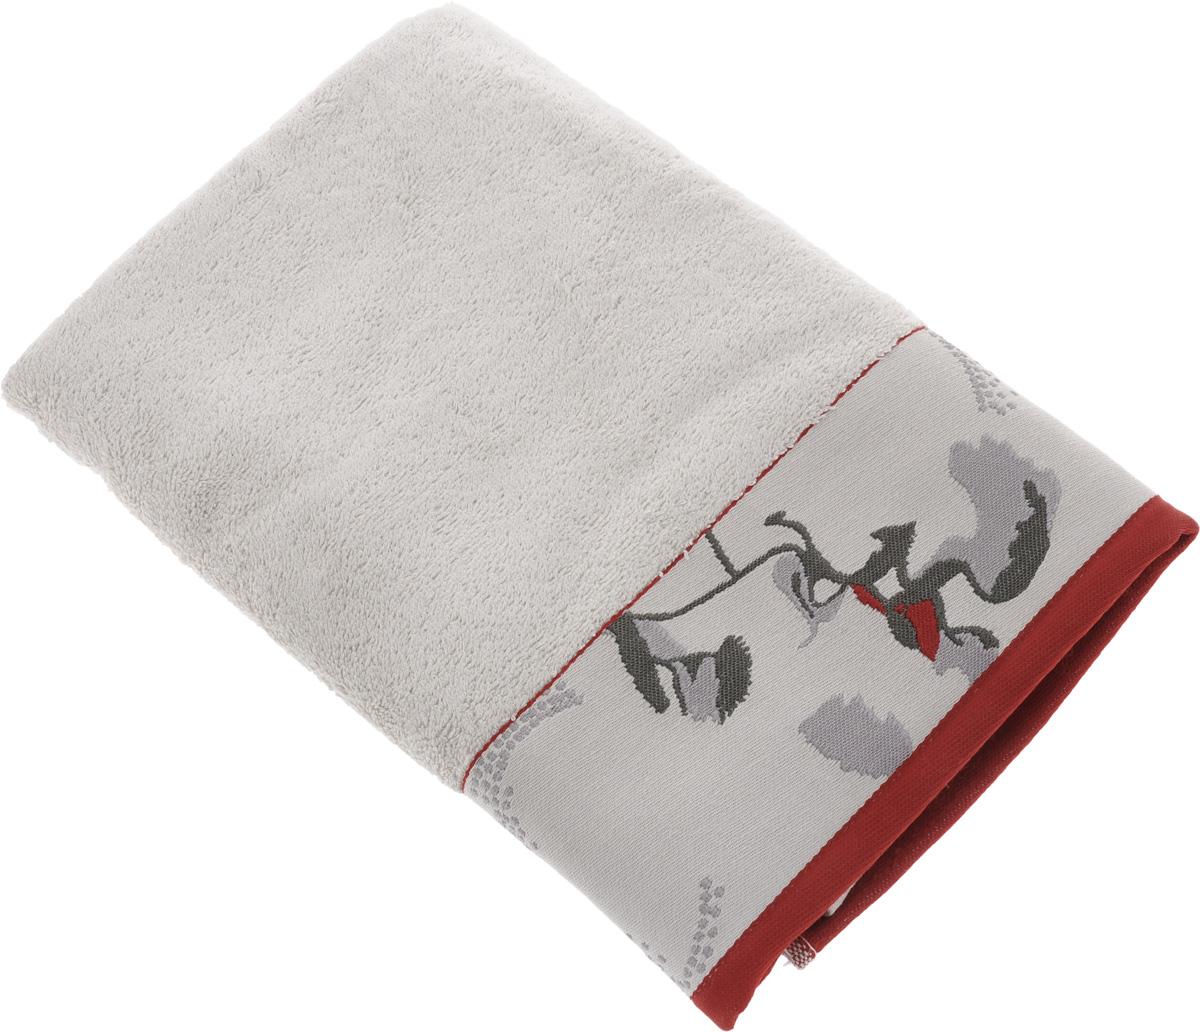 "Полотенце Mona Liza ""Two"", цвет: светло-серый, красный, 70 х 140 см 529678/2"